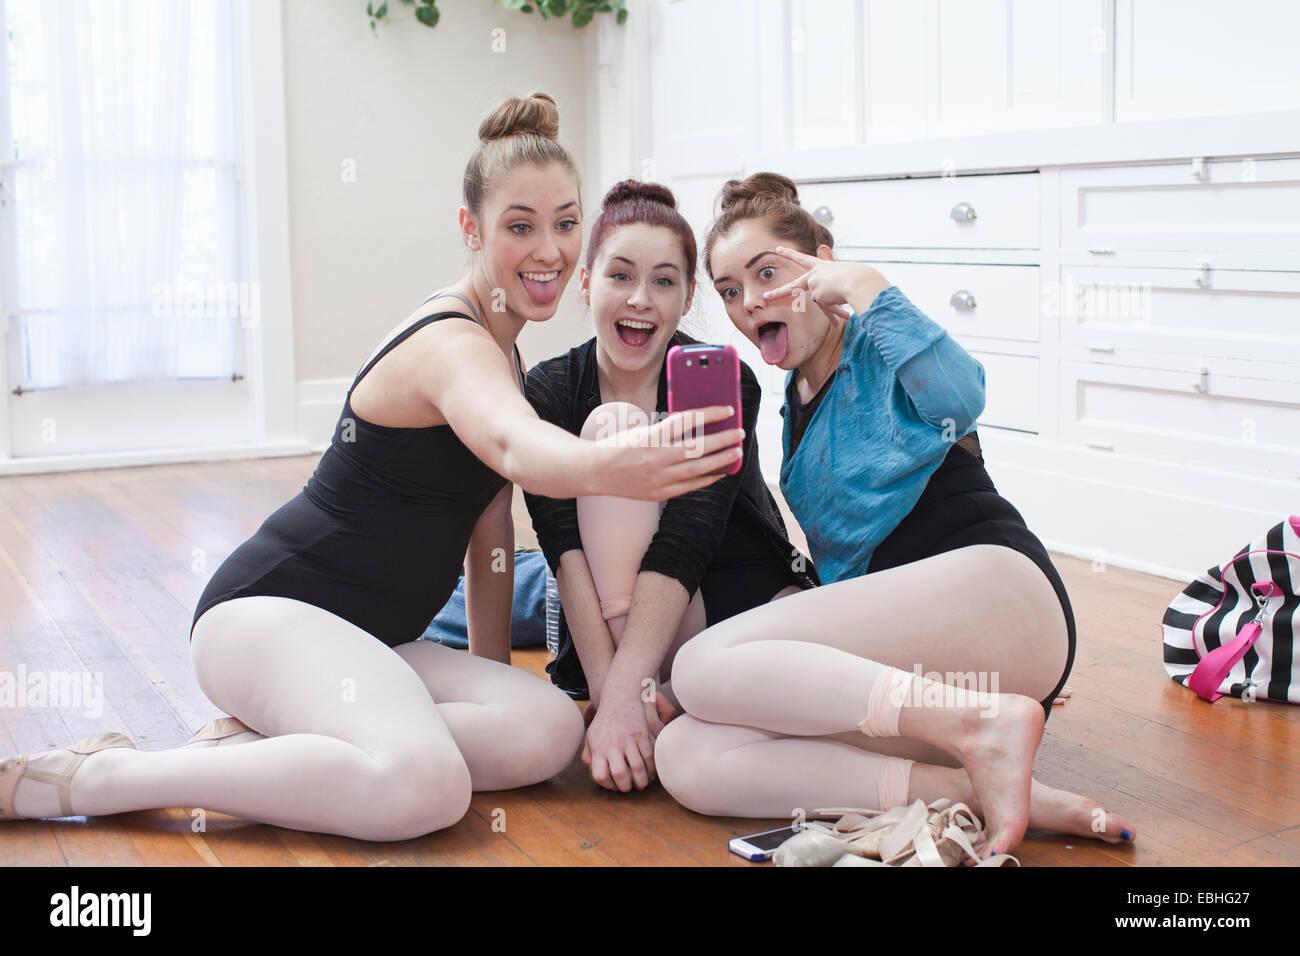 Three teenage girls taking smartphone selfie in ballet school - Stock Image